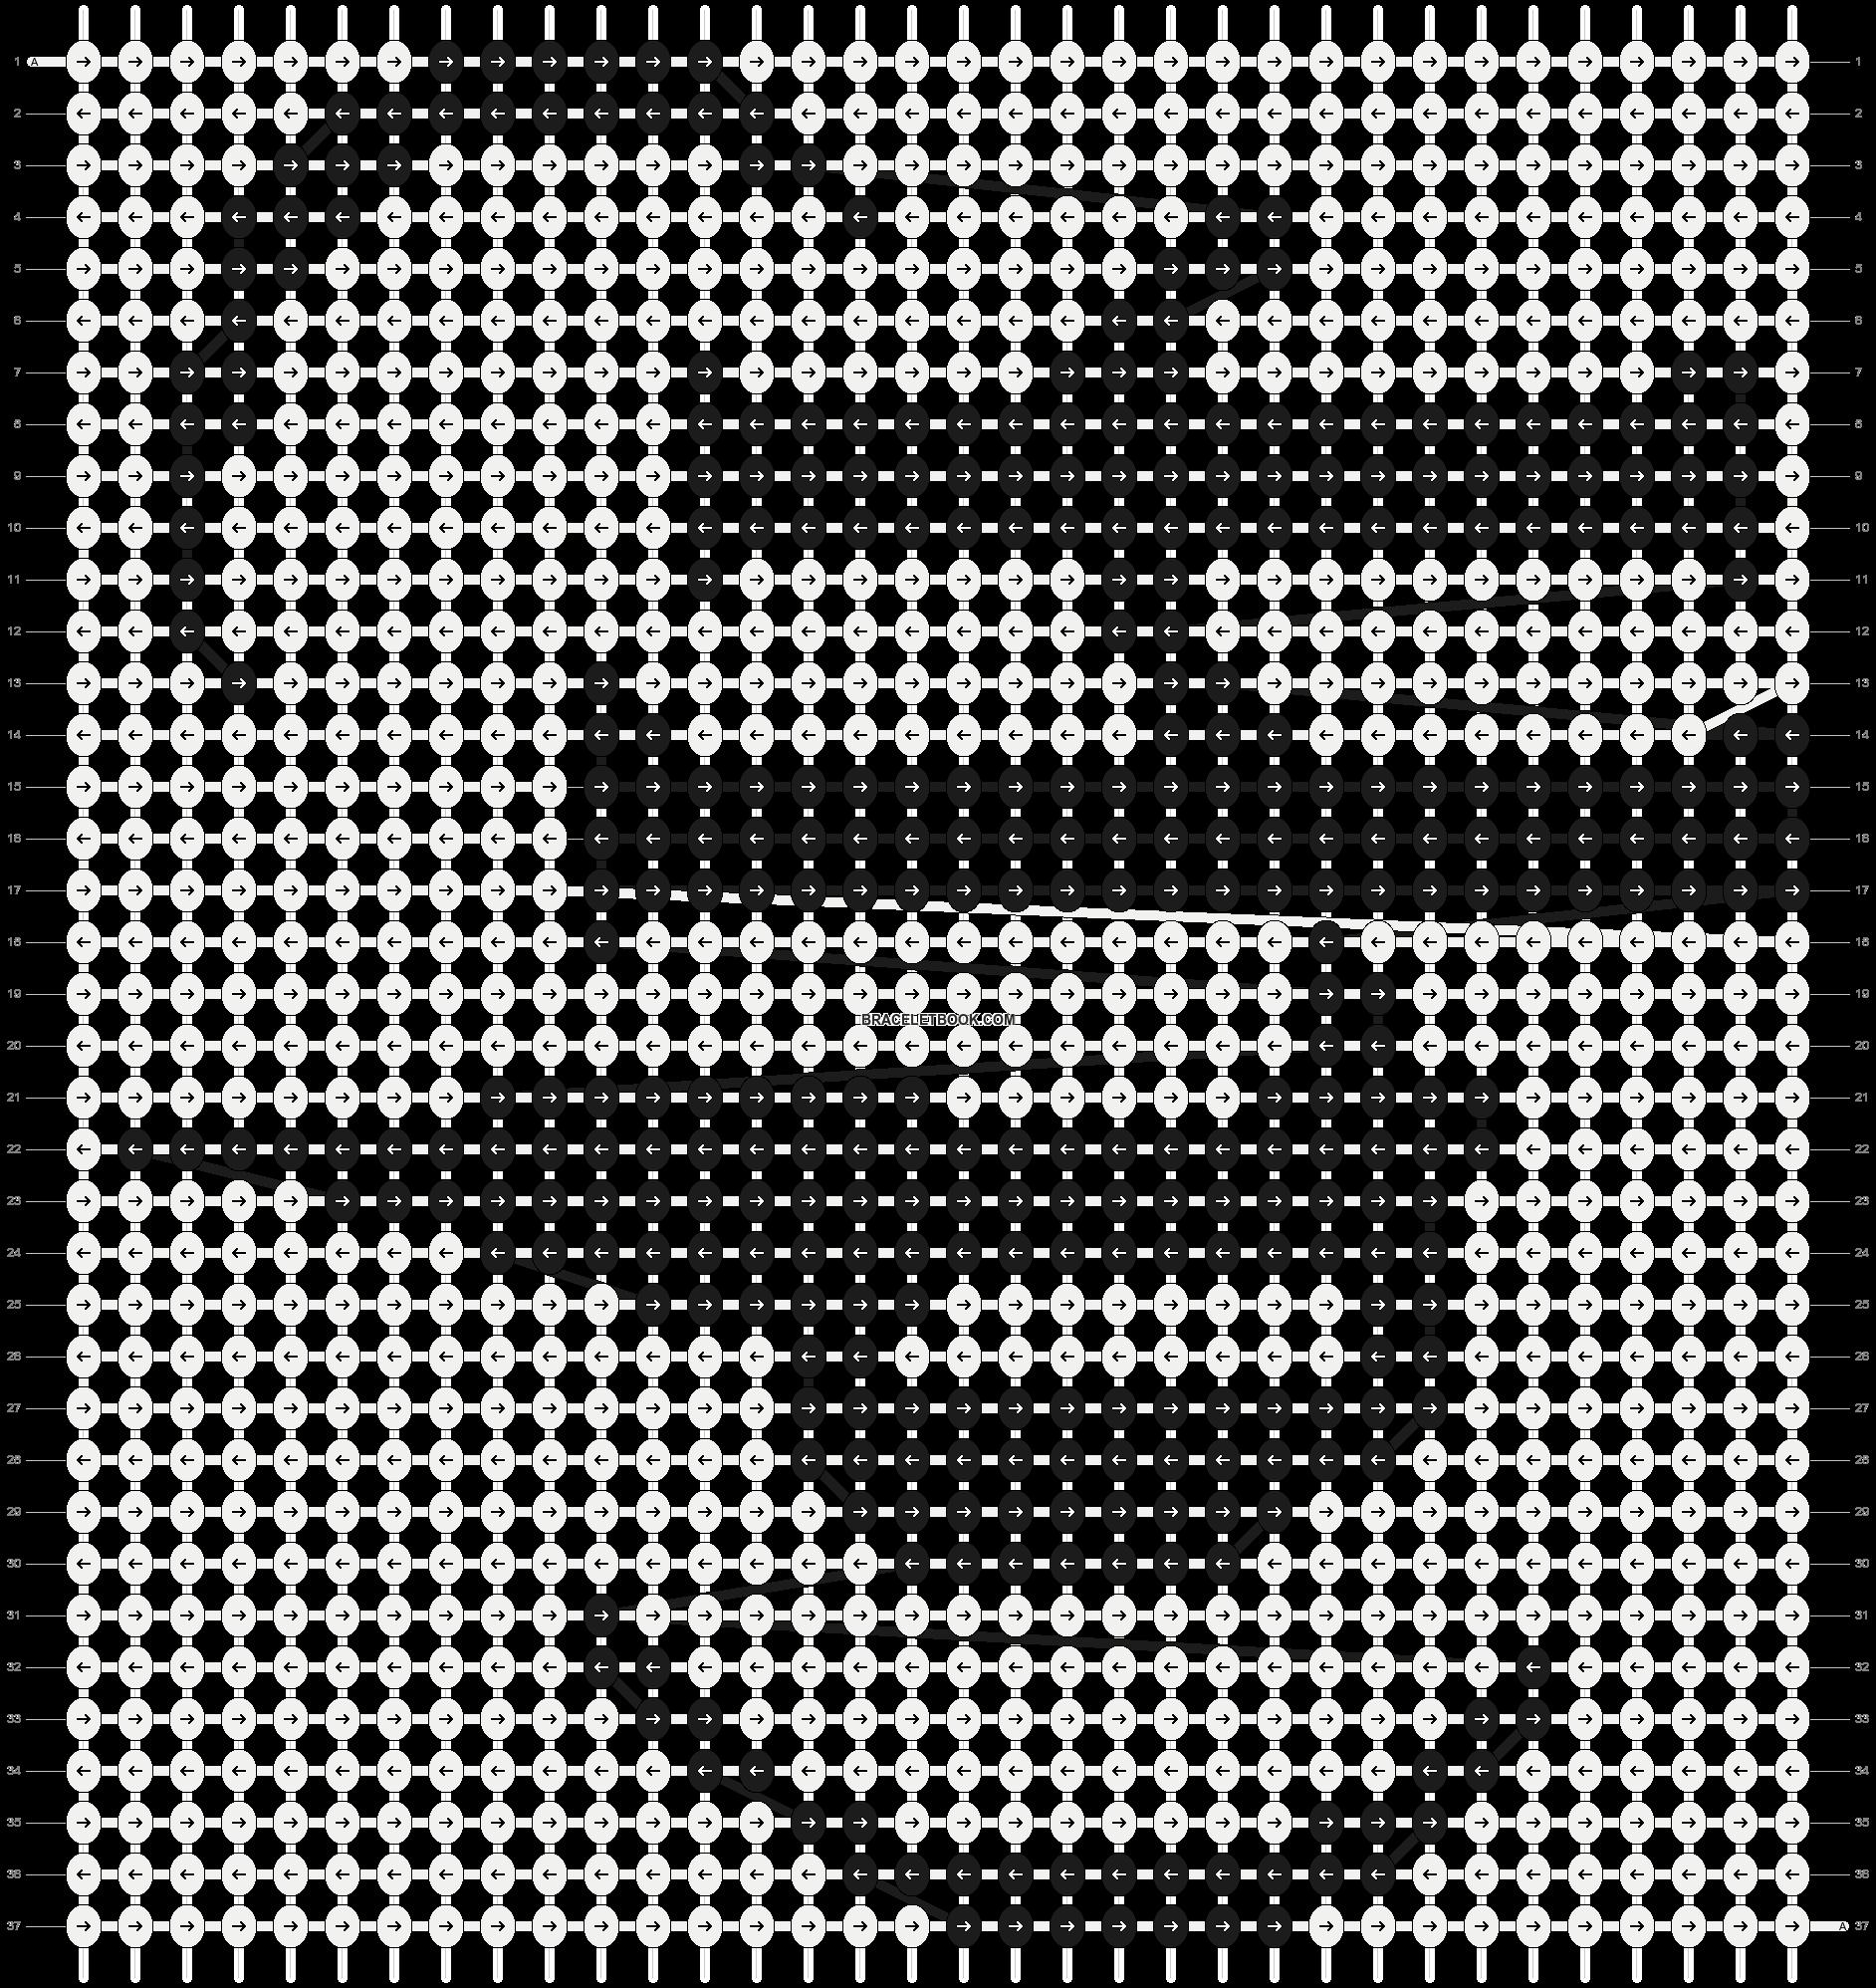 Alpha Pattern #3020 added by bollocks